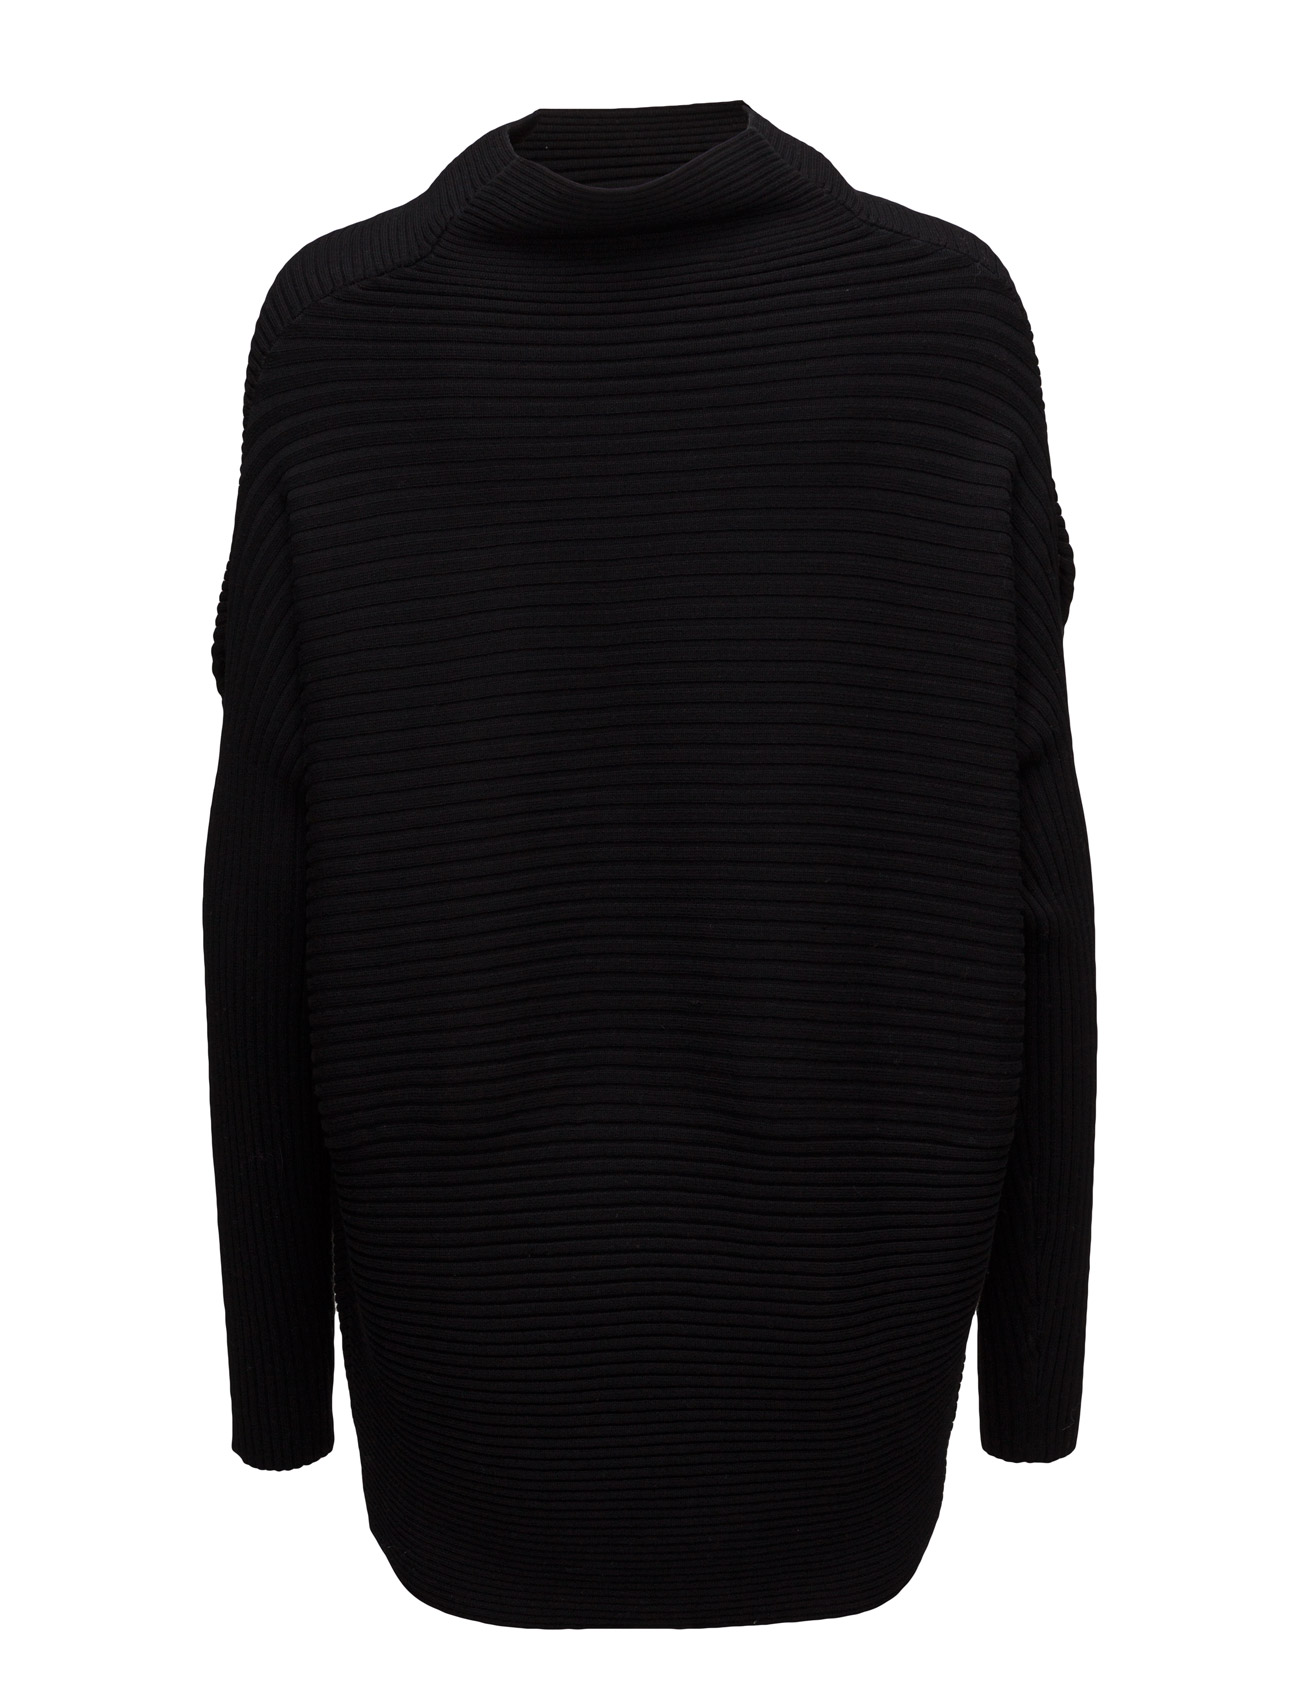 368875877b57 Shop Ribly Drape Designers Remix Sweatshirts i Dusty Brown til Kvinder fra  Boozt